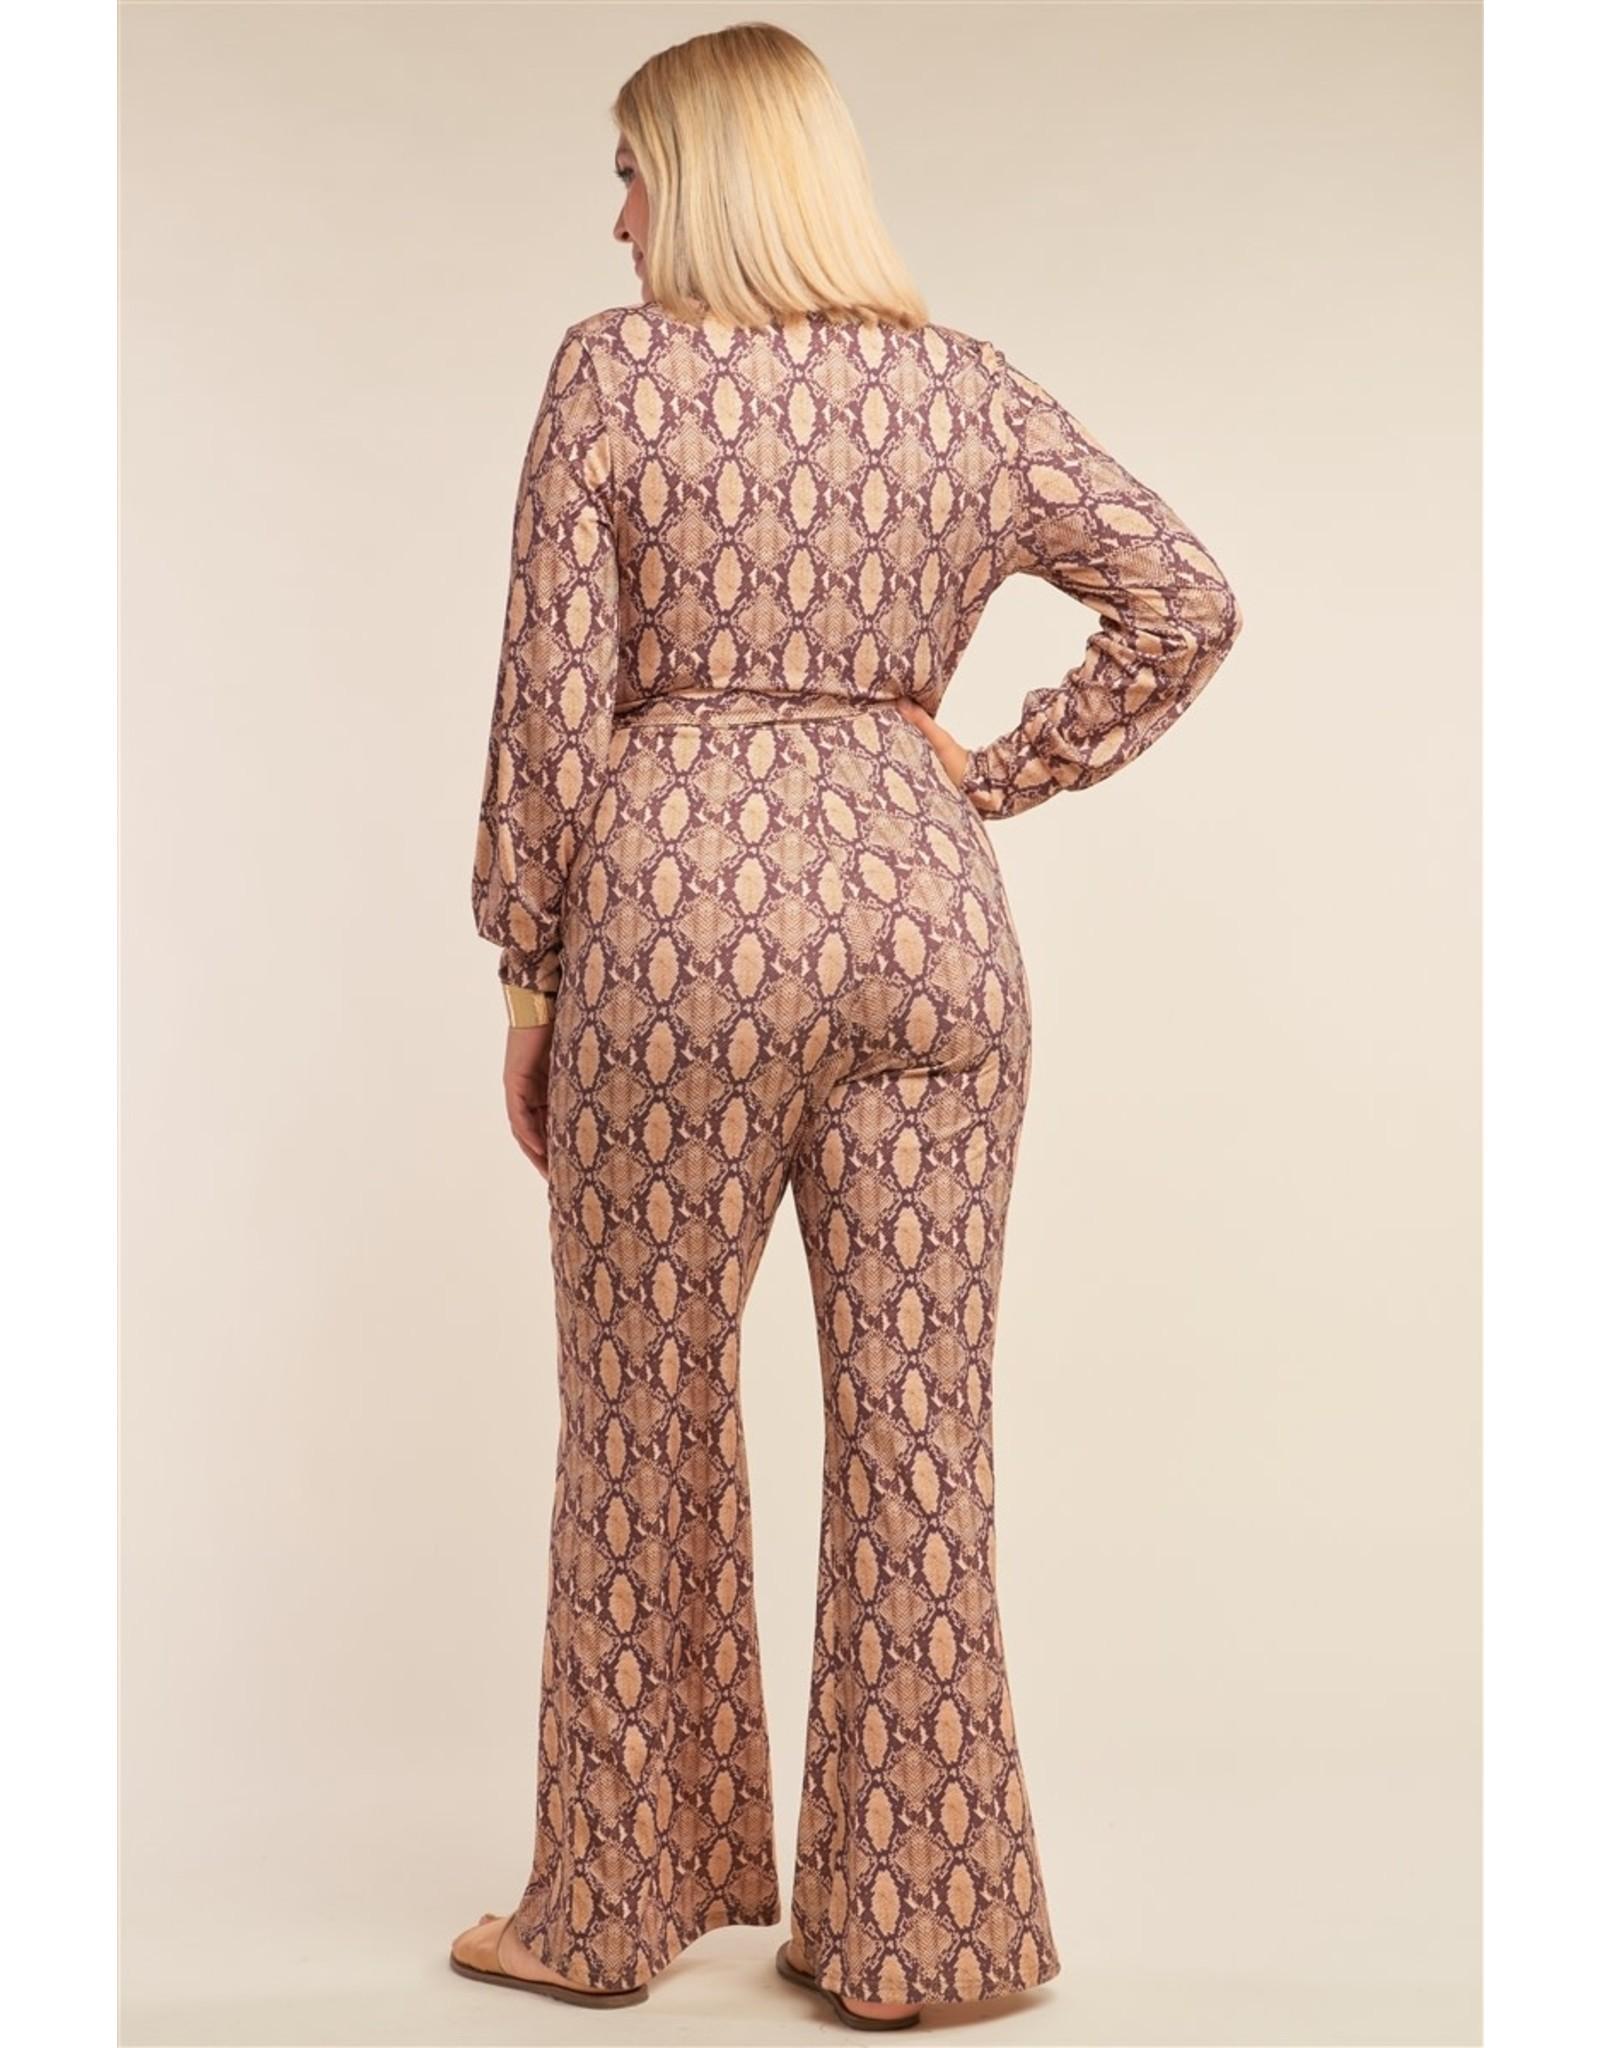 Python Print Long Sleeve Wrap V-Neck Flare Leg Jumpsuit